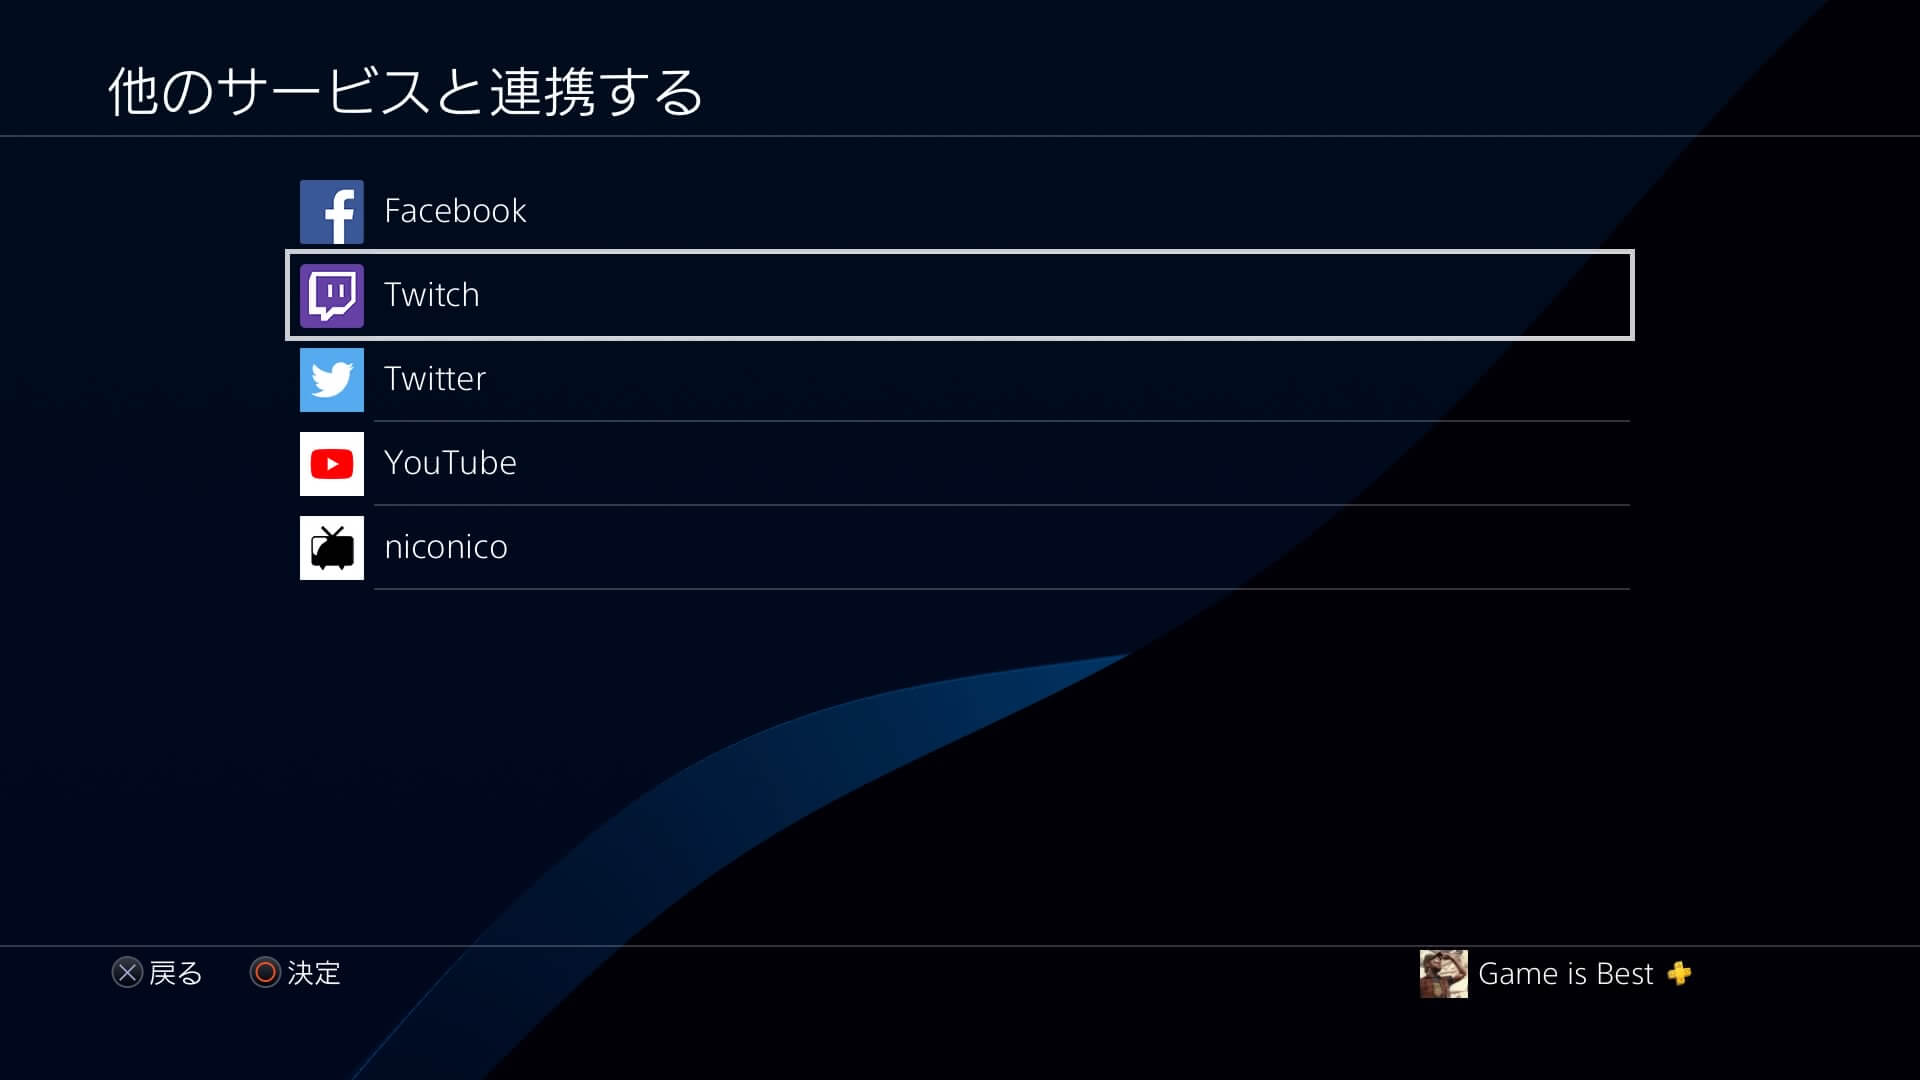 PS4で配信する方法